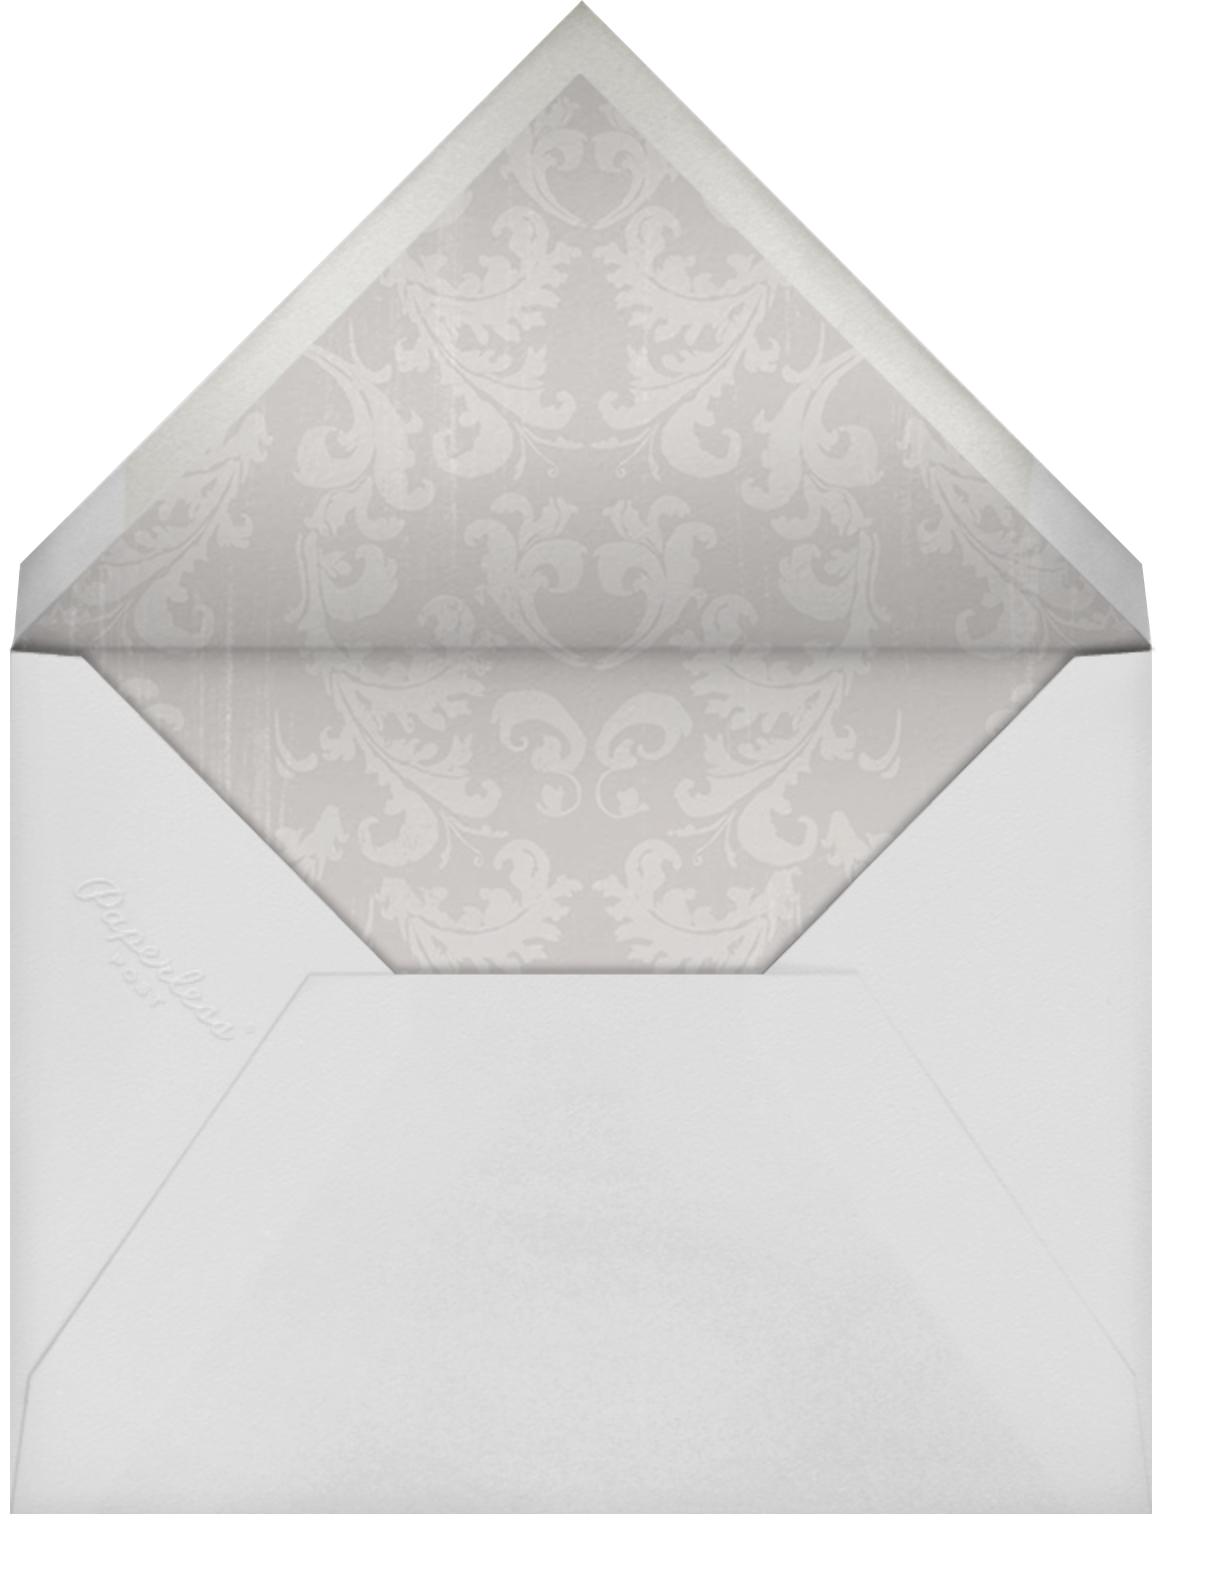 Triple Interior Border (Tall) - Gold - Paperless Post - Wedding postponement - envelope back